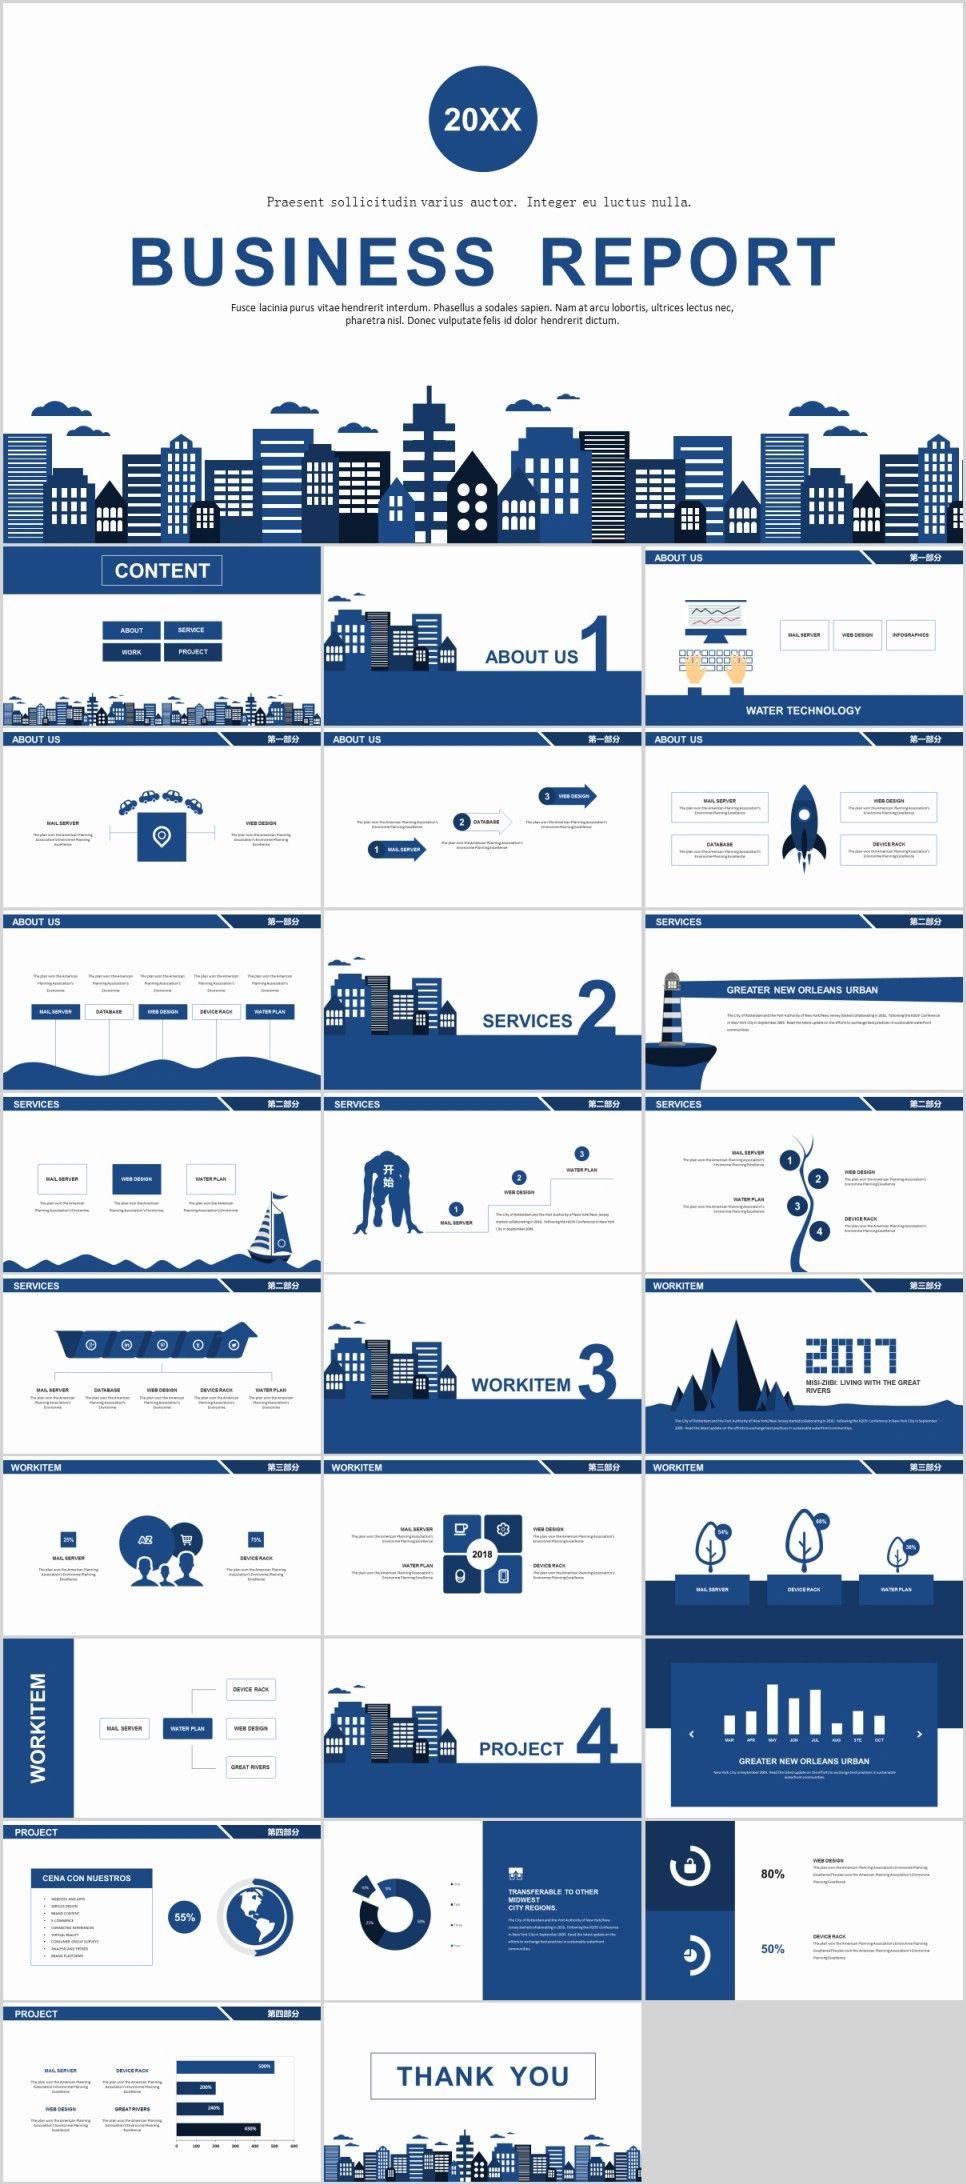 27 blue simple business report powerpoint templates apresentao 27 blue simple business report powerpoint templates powerpoint templates presentation animation toneelgroepblik Choice Image